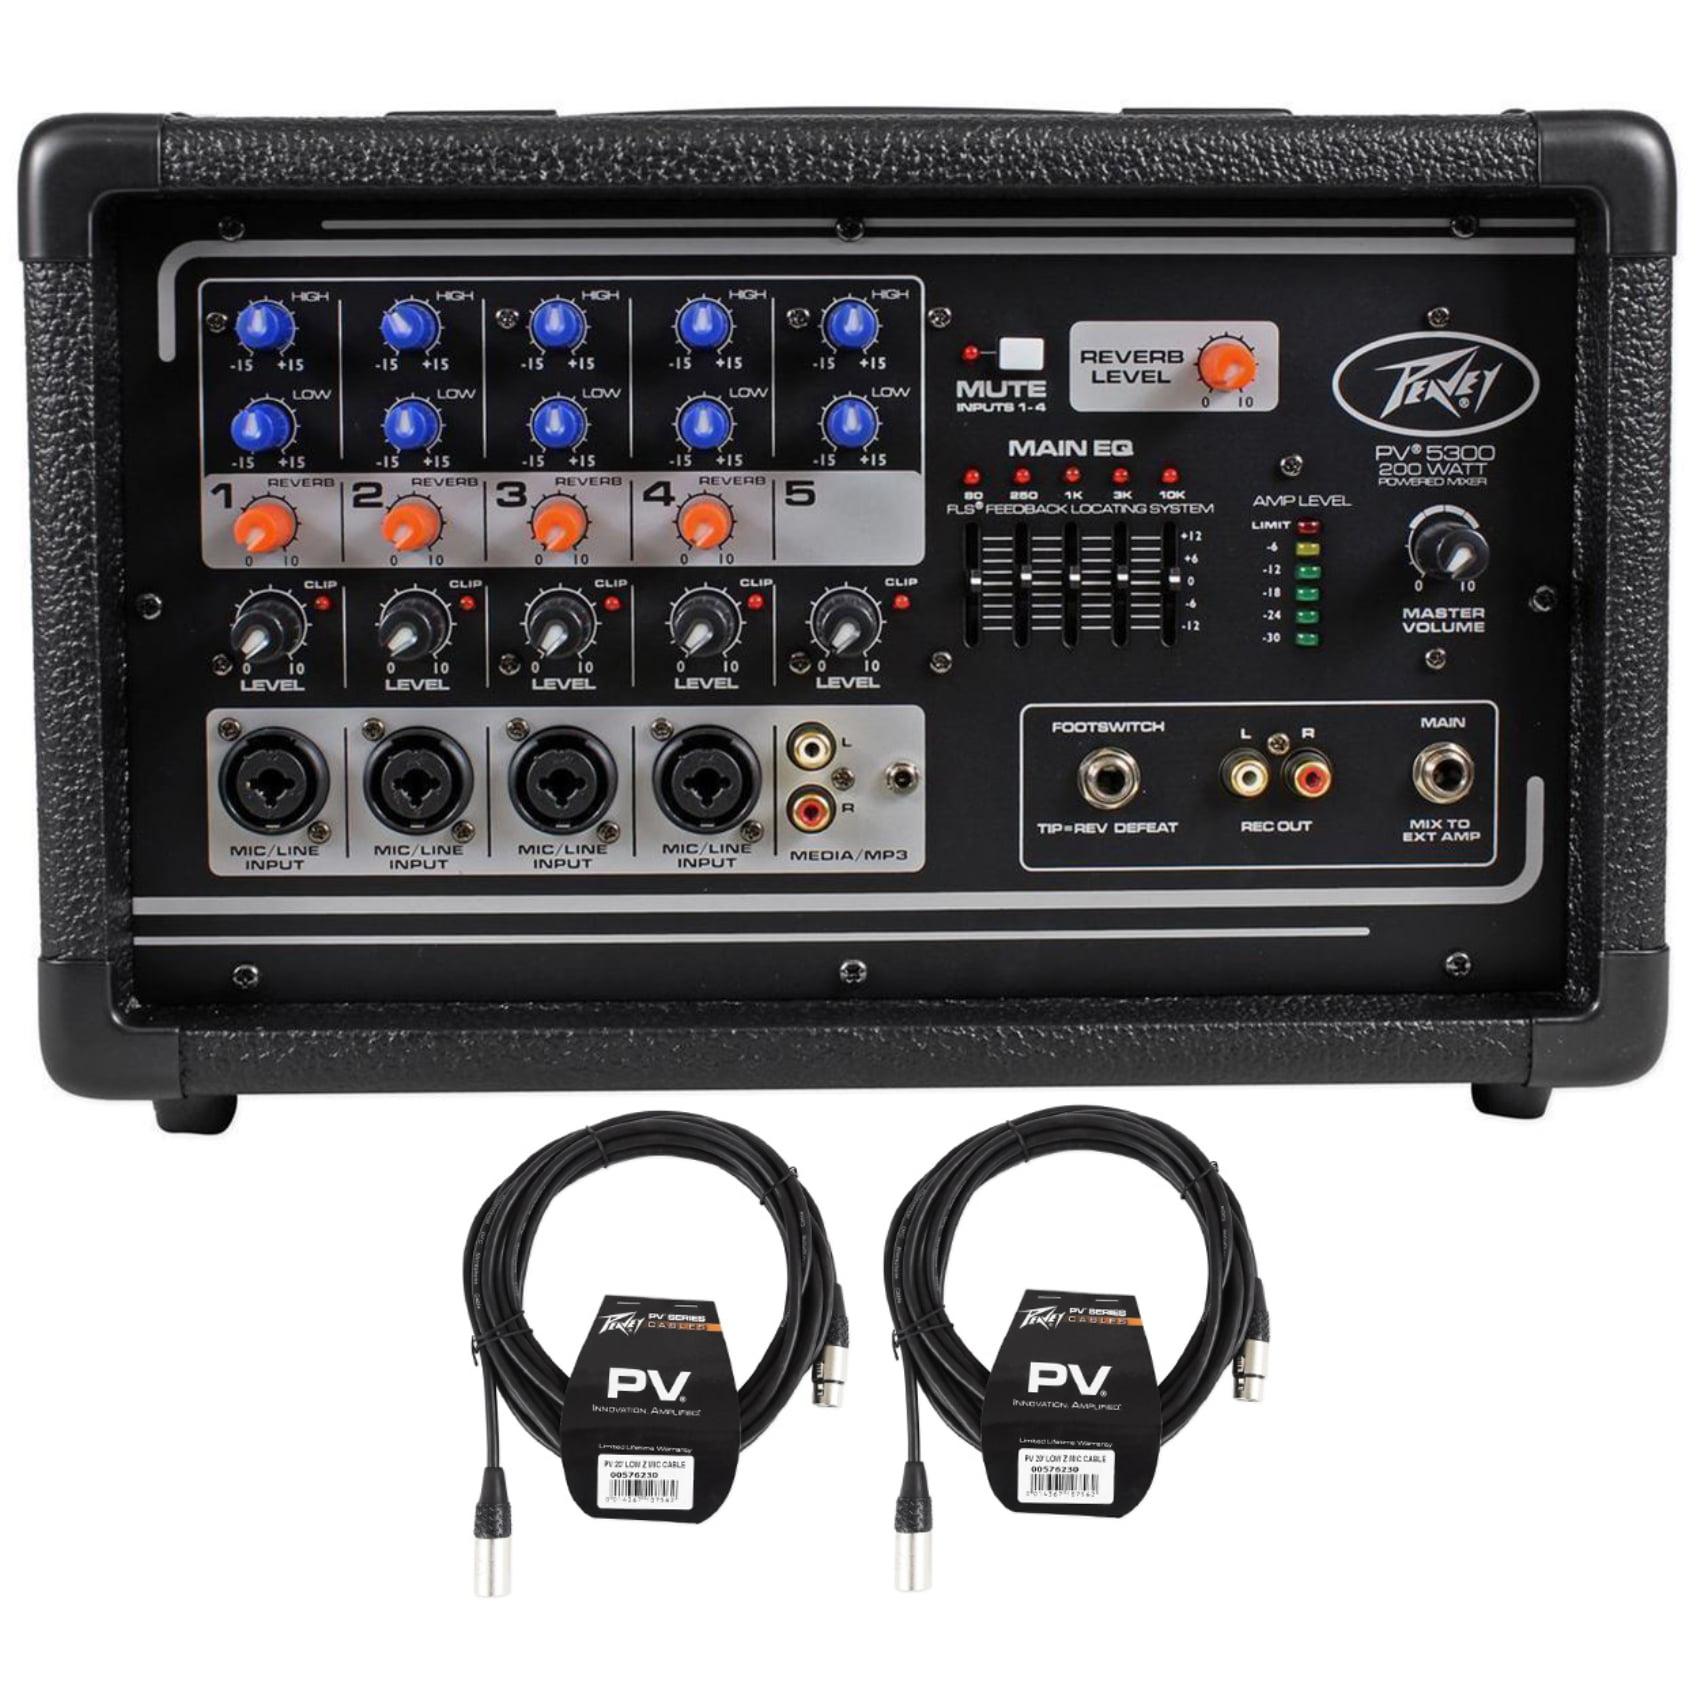 Peavey PV5300 200 Watt 5-Channel Powered Mixer + (2) XLR Cables PV 5300